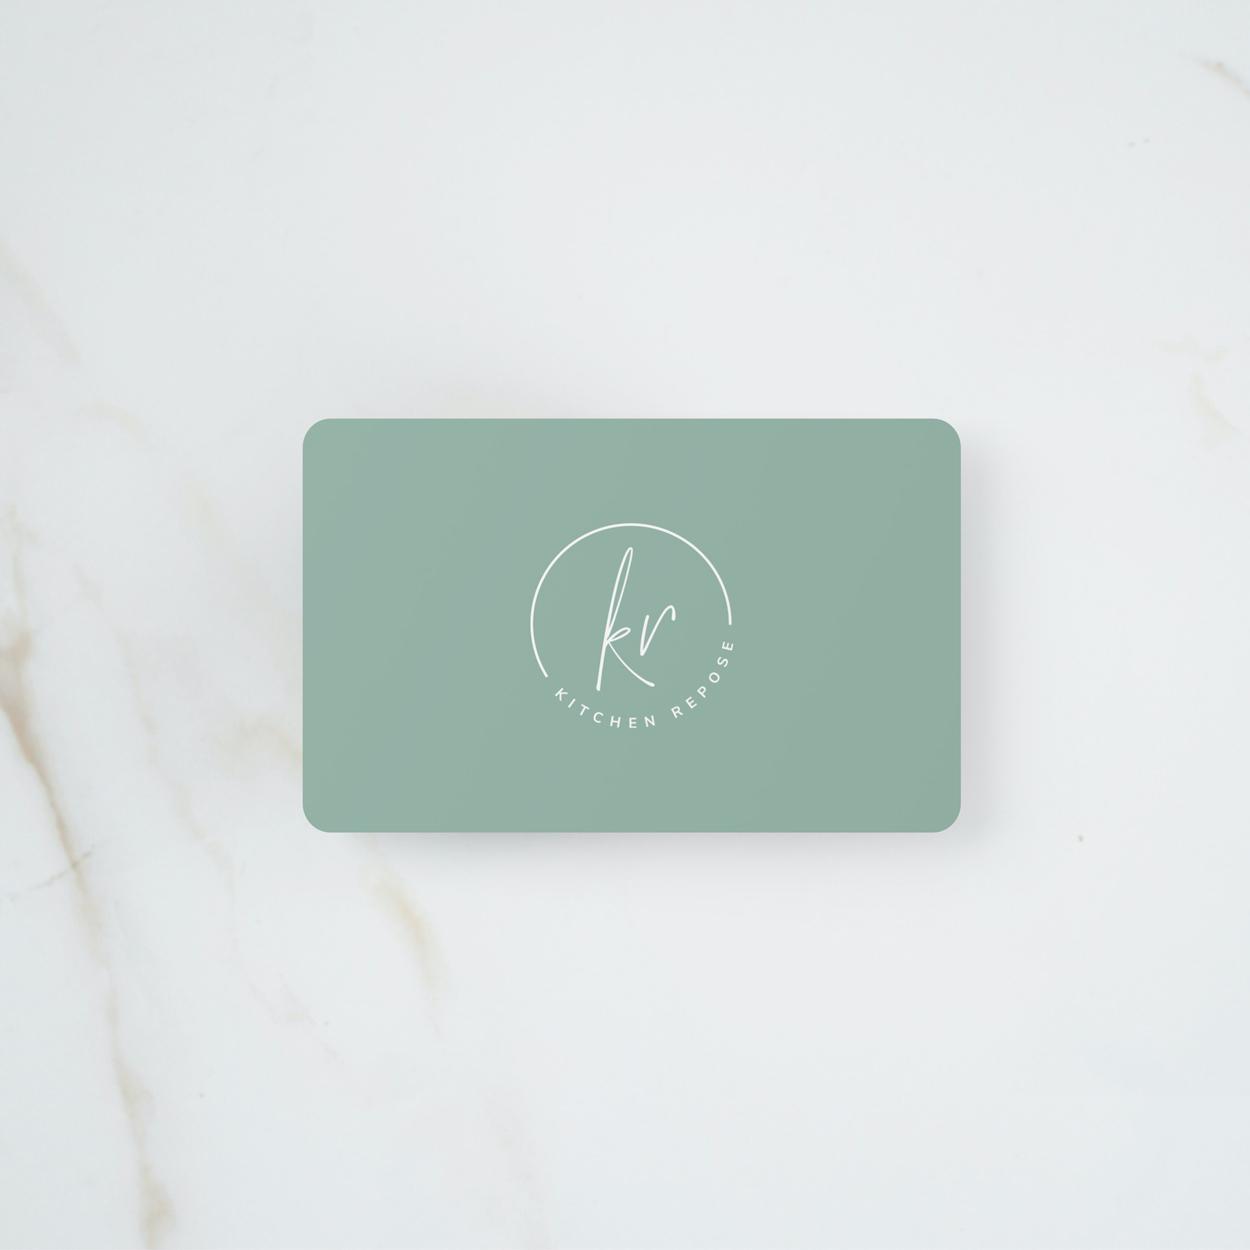 KR gift card mockup